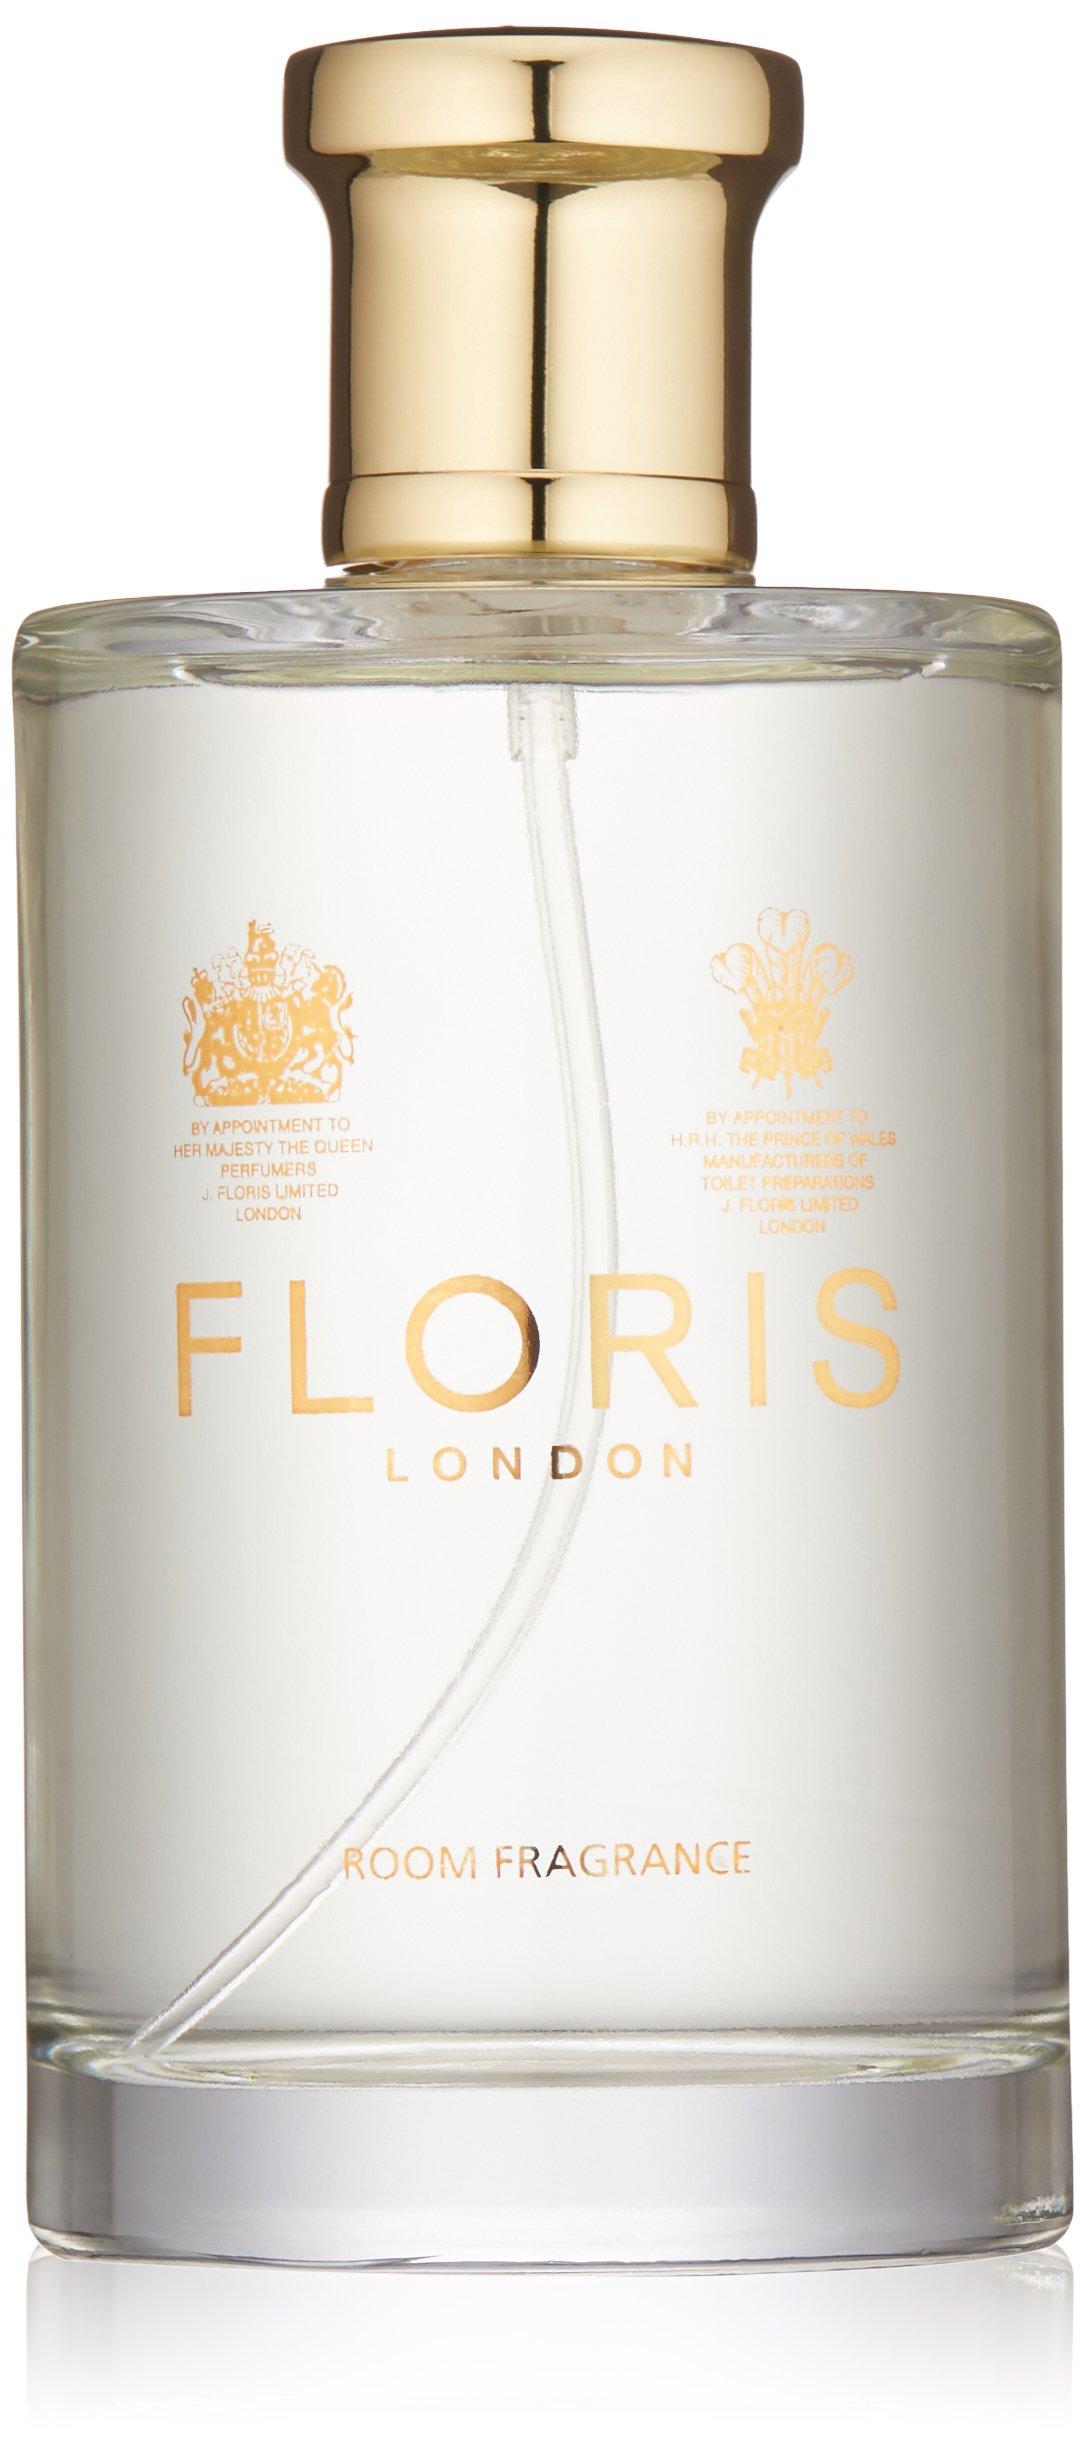 Floris London Sandalwood & Patchouli Room Fragrance, 3.4 Fl Oz